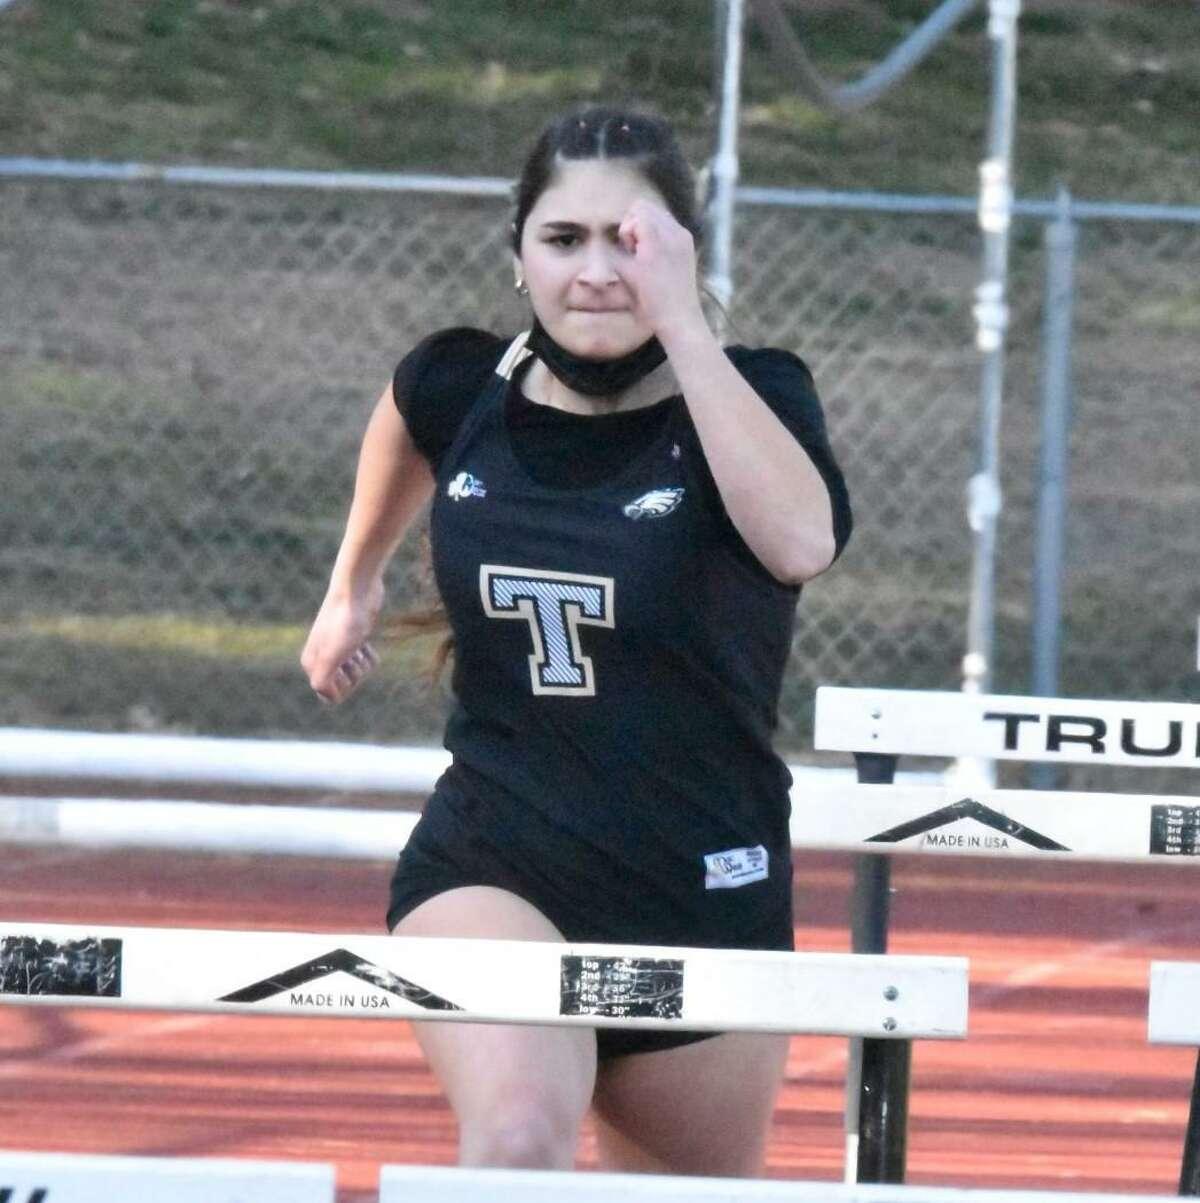 Junior Celine Bozukluian was a standout in the 55-meter hurdles for Trumbull indoor track.